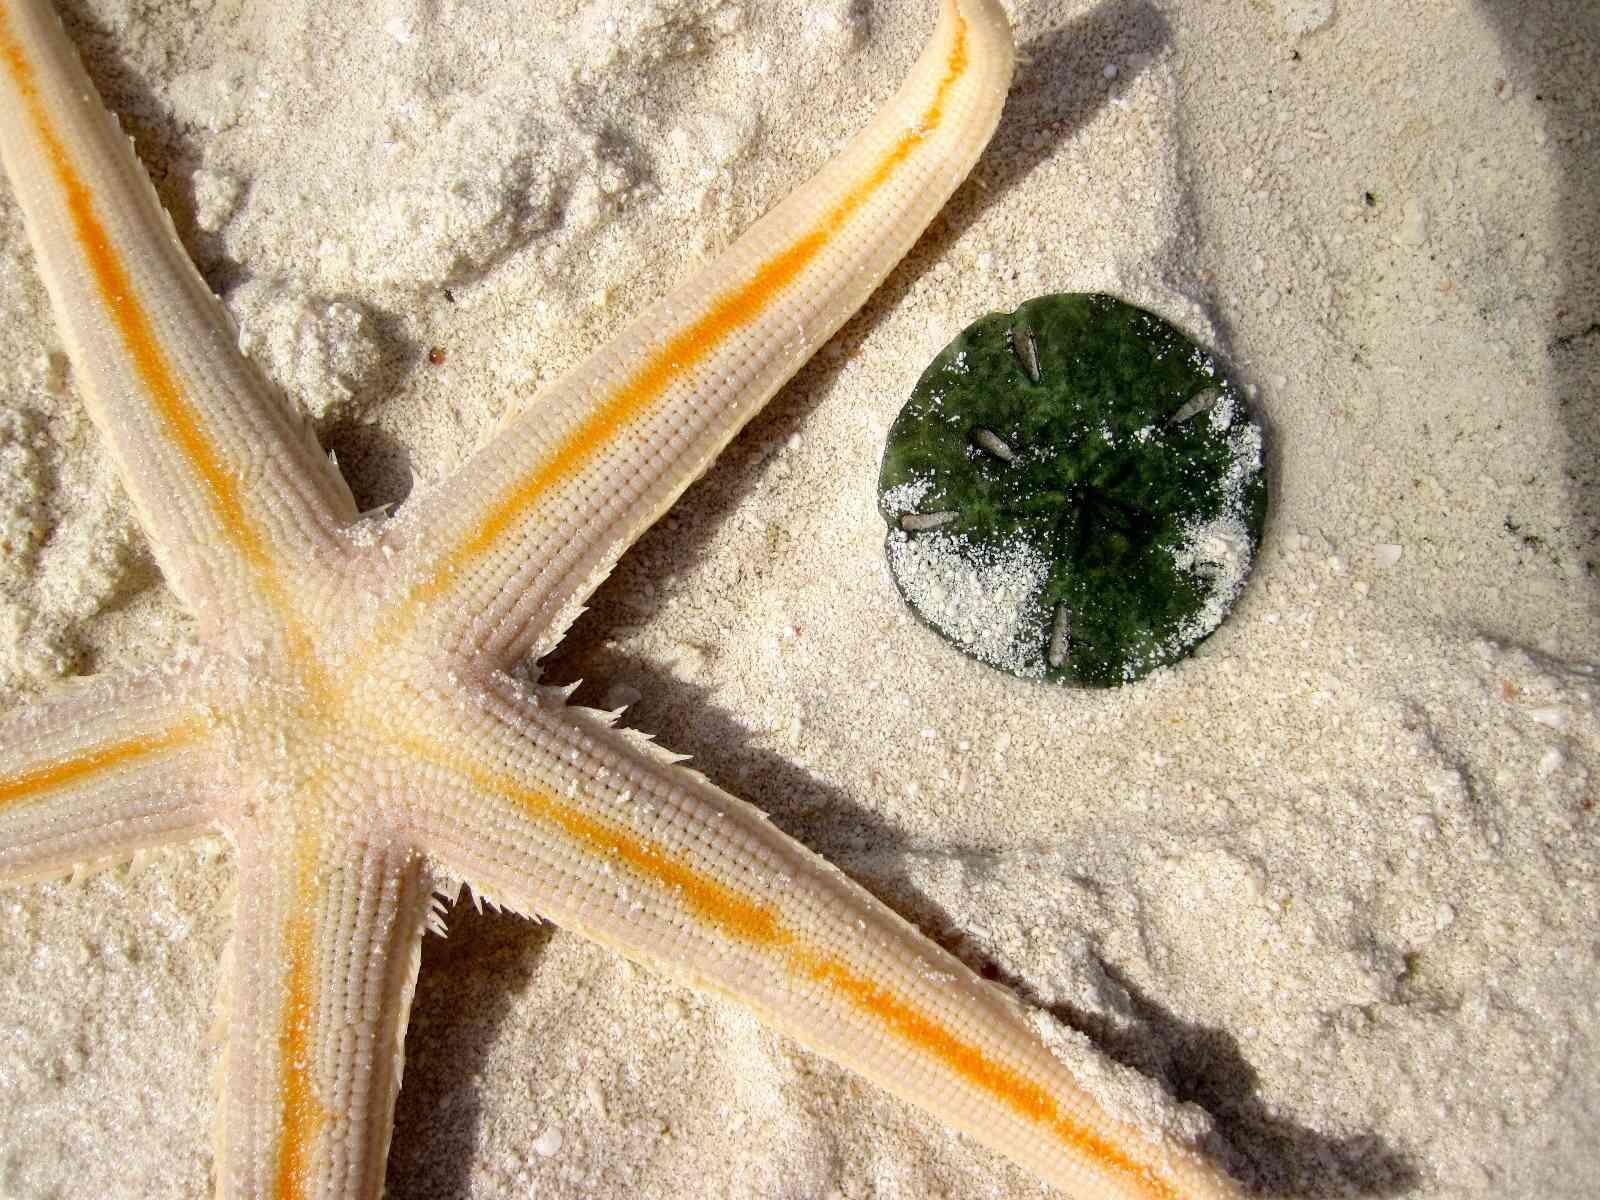 A sand dollar and a sea star, or starfish